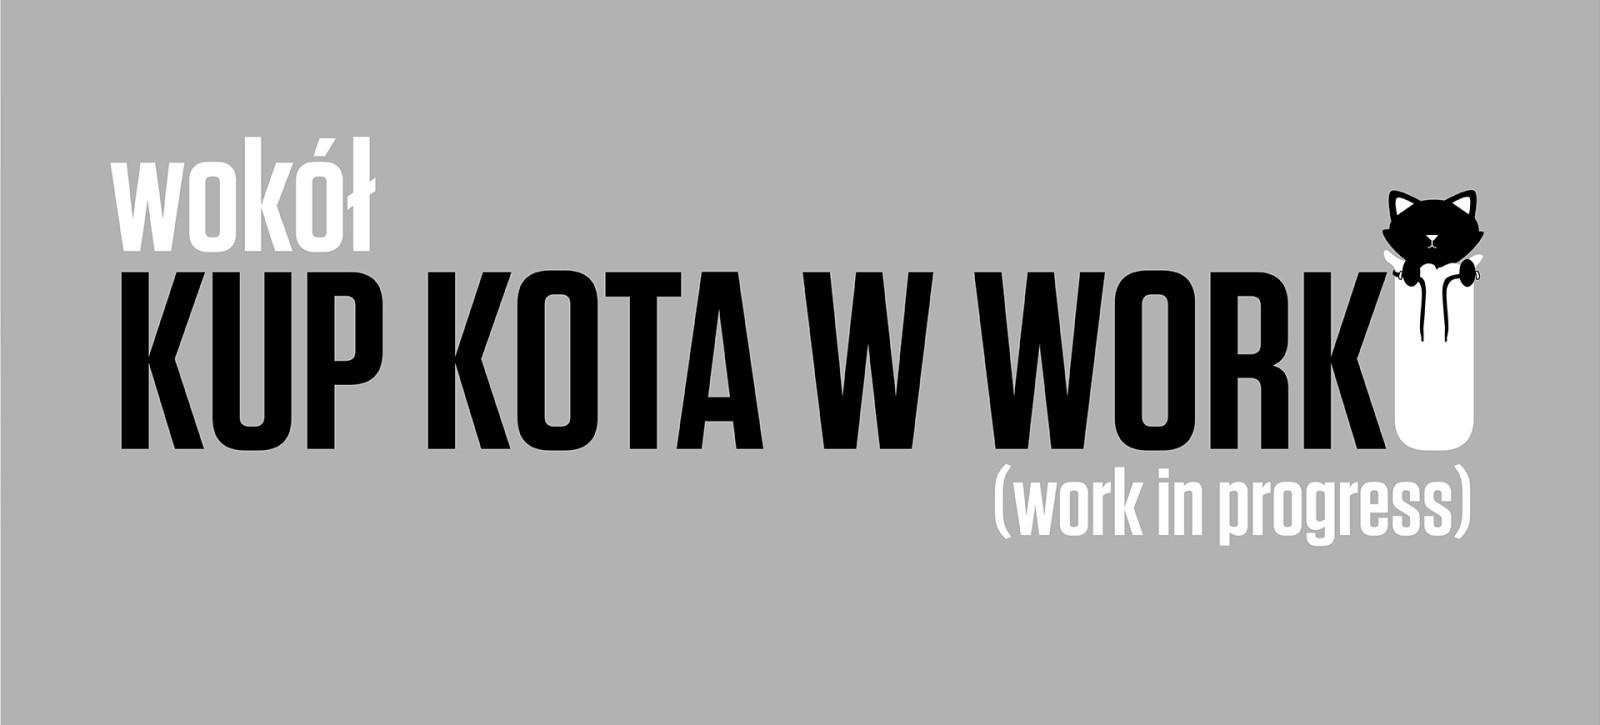 36_Wokół_Kup_kota_w_worku_(work in progress)_grafika_deabty